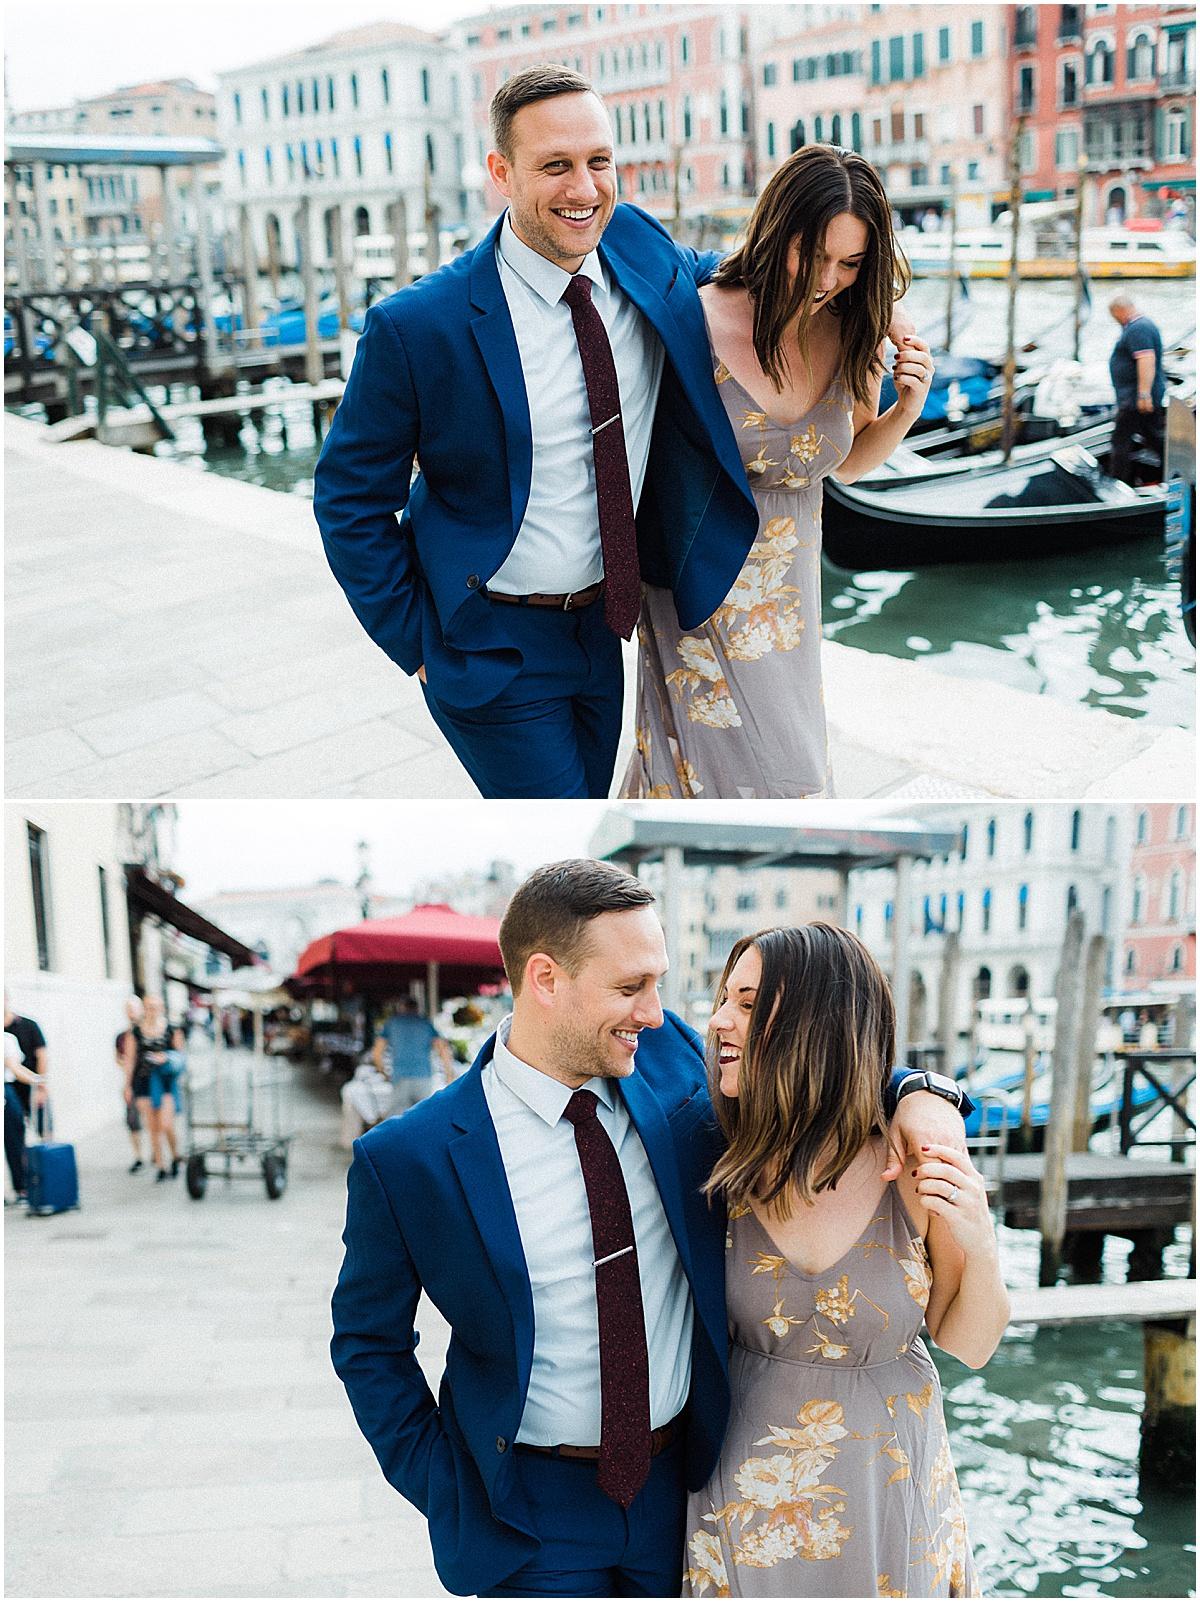 lifestyle-portrait-photography-couple-in-venice-gondola-sunrise-stefano-degirmenci_0219.jpg